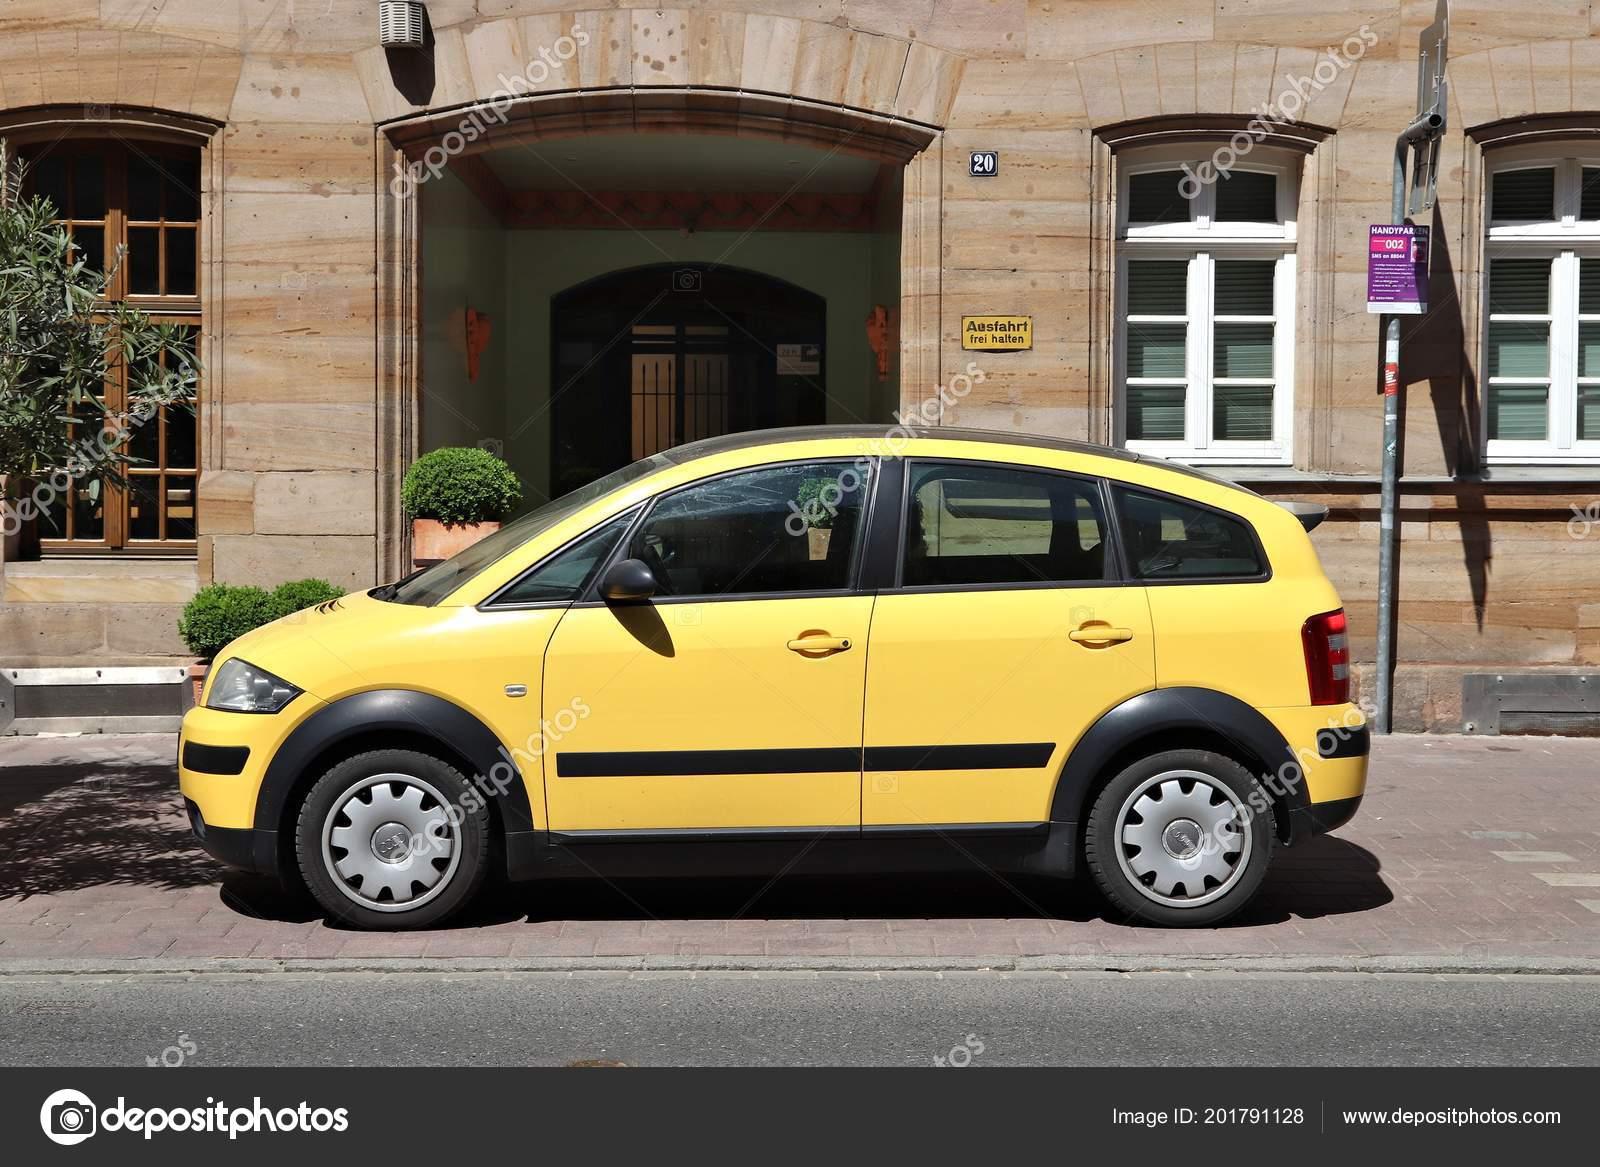 Furth Germany May 2018 Yellow Audi Compact Mini Car Parked Stock